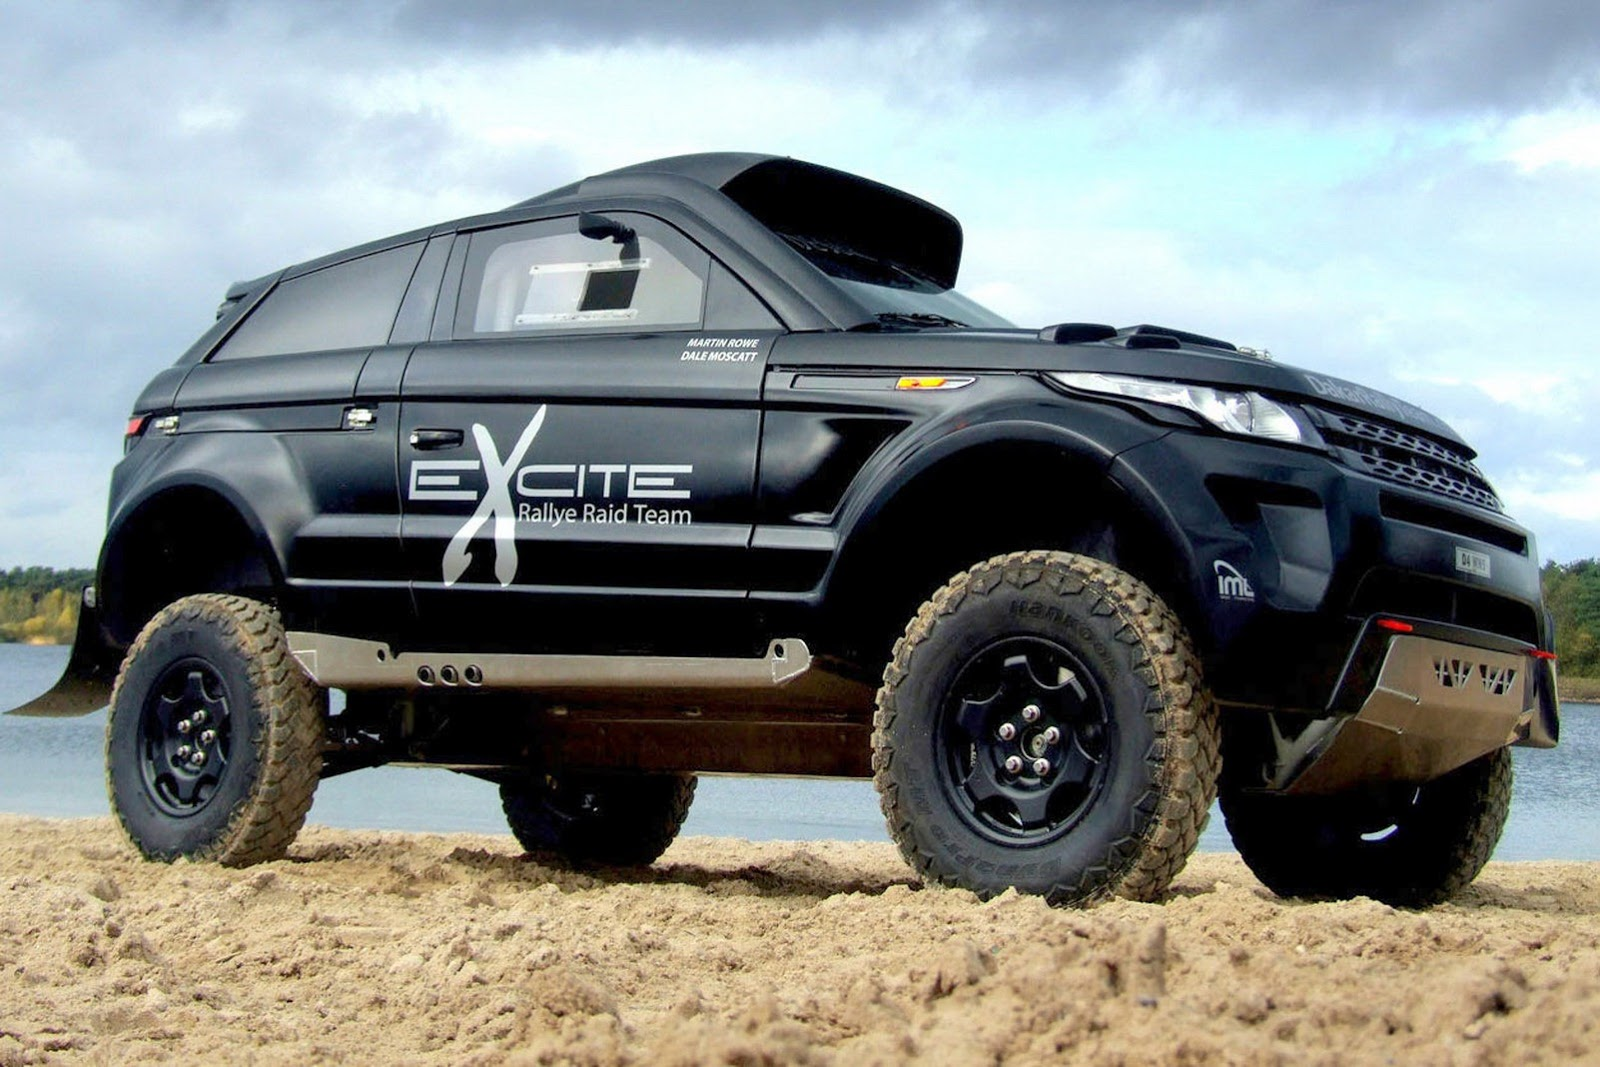 range rover evoque desert warrior 3 excite rallye raid team garage car. Black Bedroom Furniture Sets. Home Design Ideas